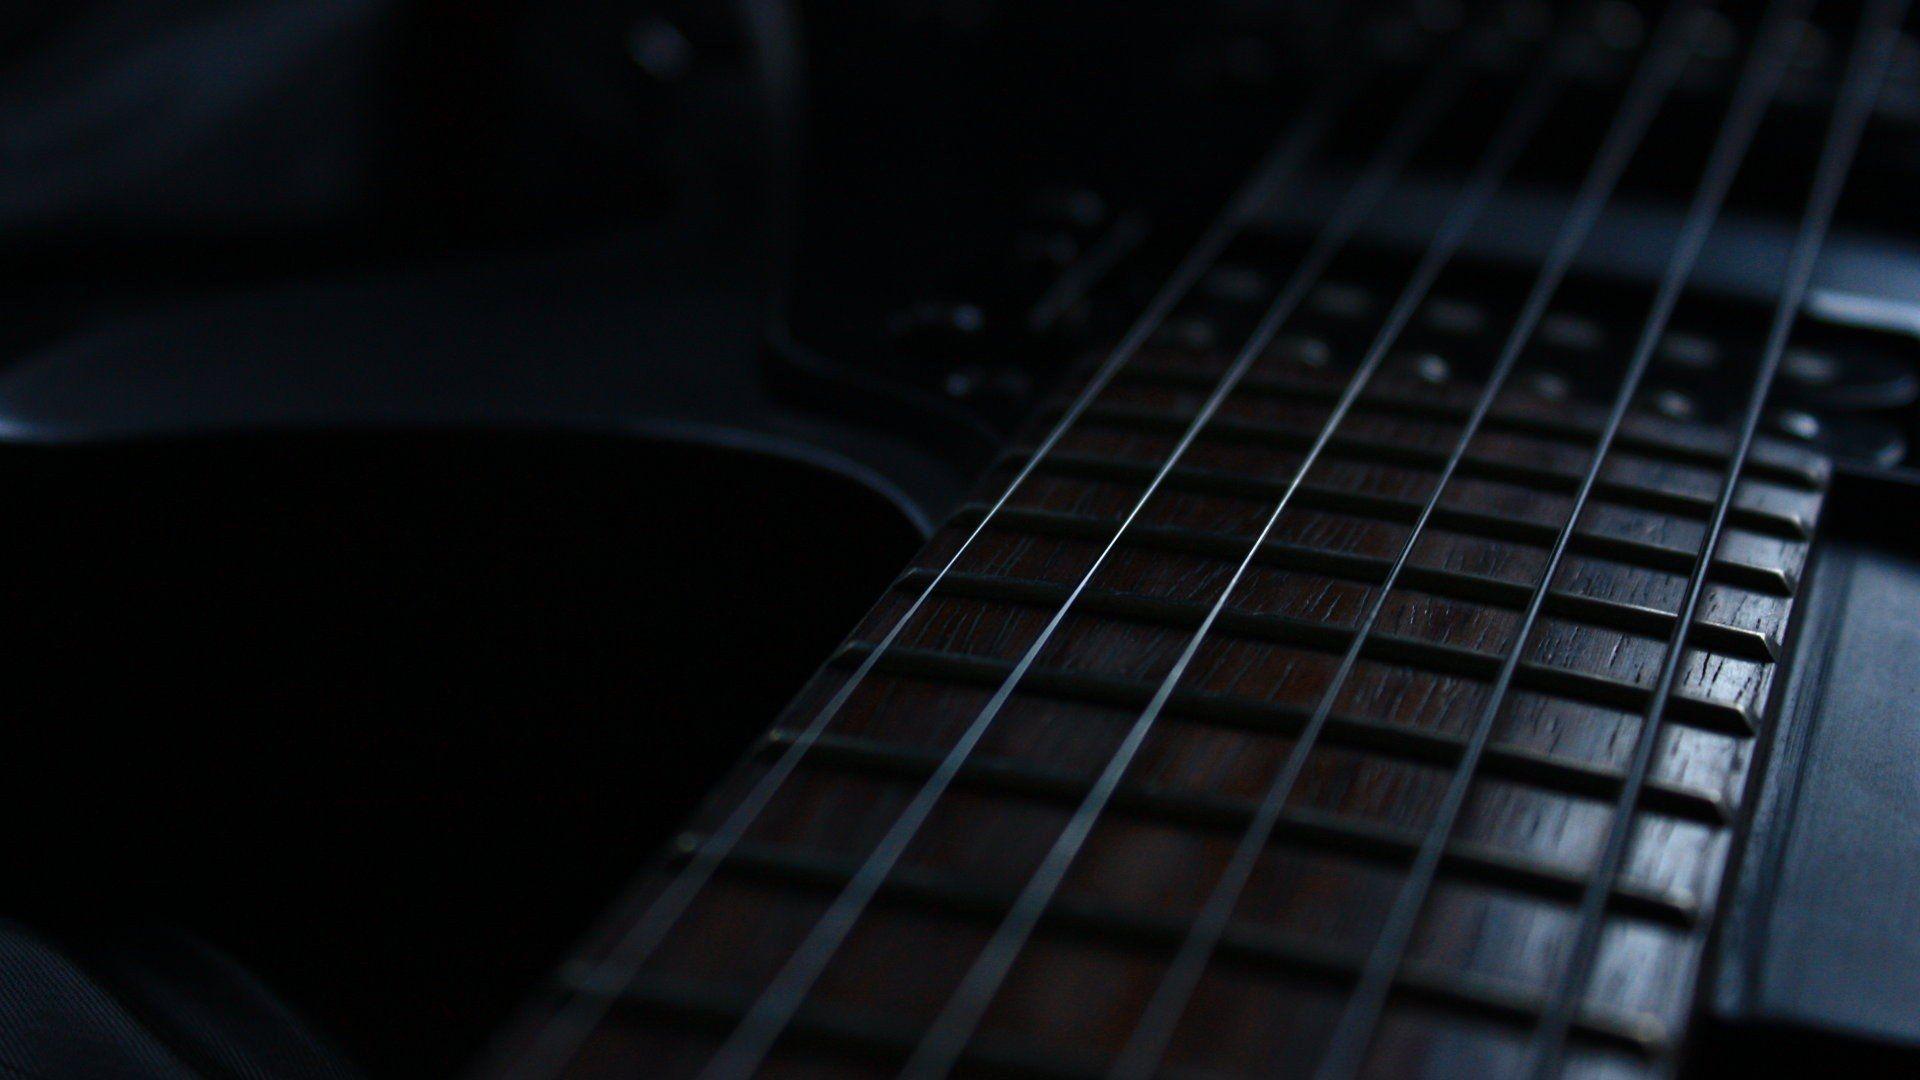 Electric Guitar strings, Computer Wallpaper